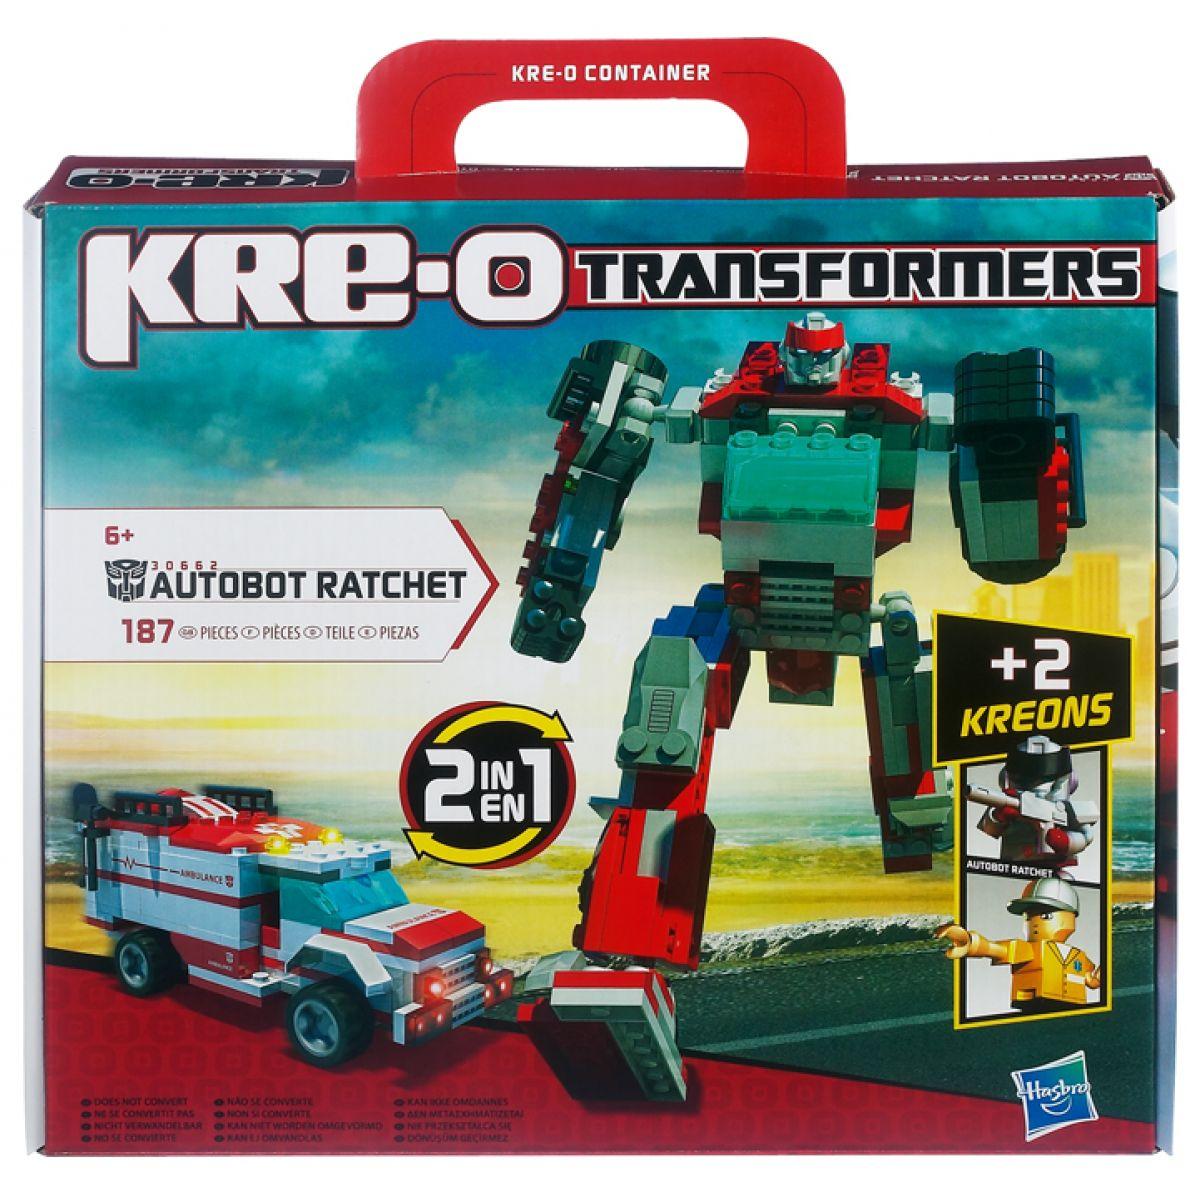 KRE-O Transformers stavebnice Autobot Ratchet Hasbro 30662